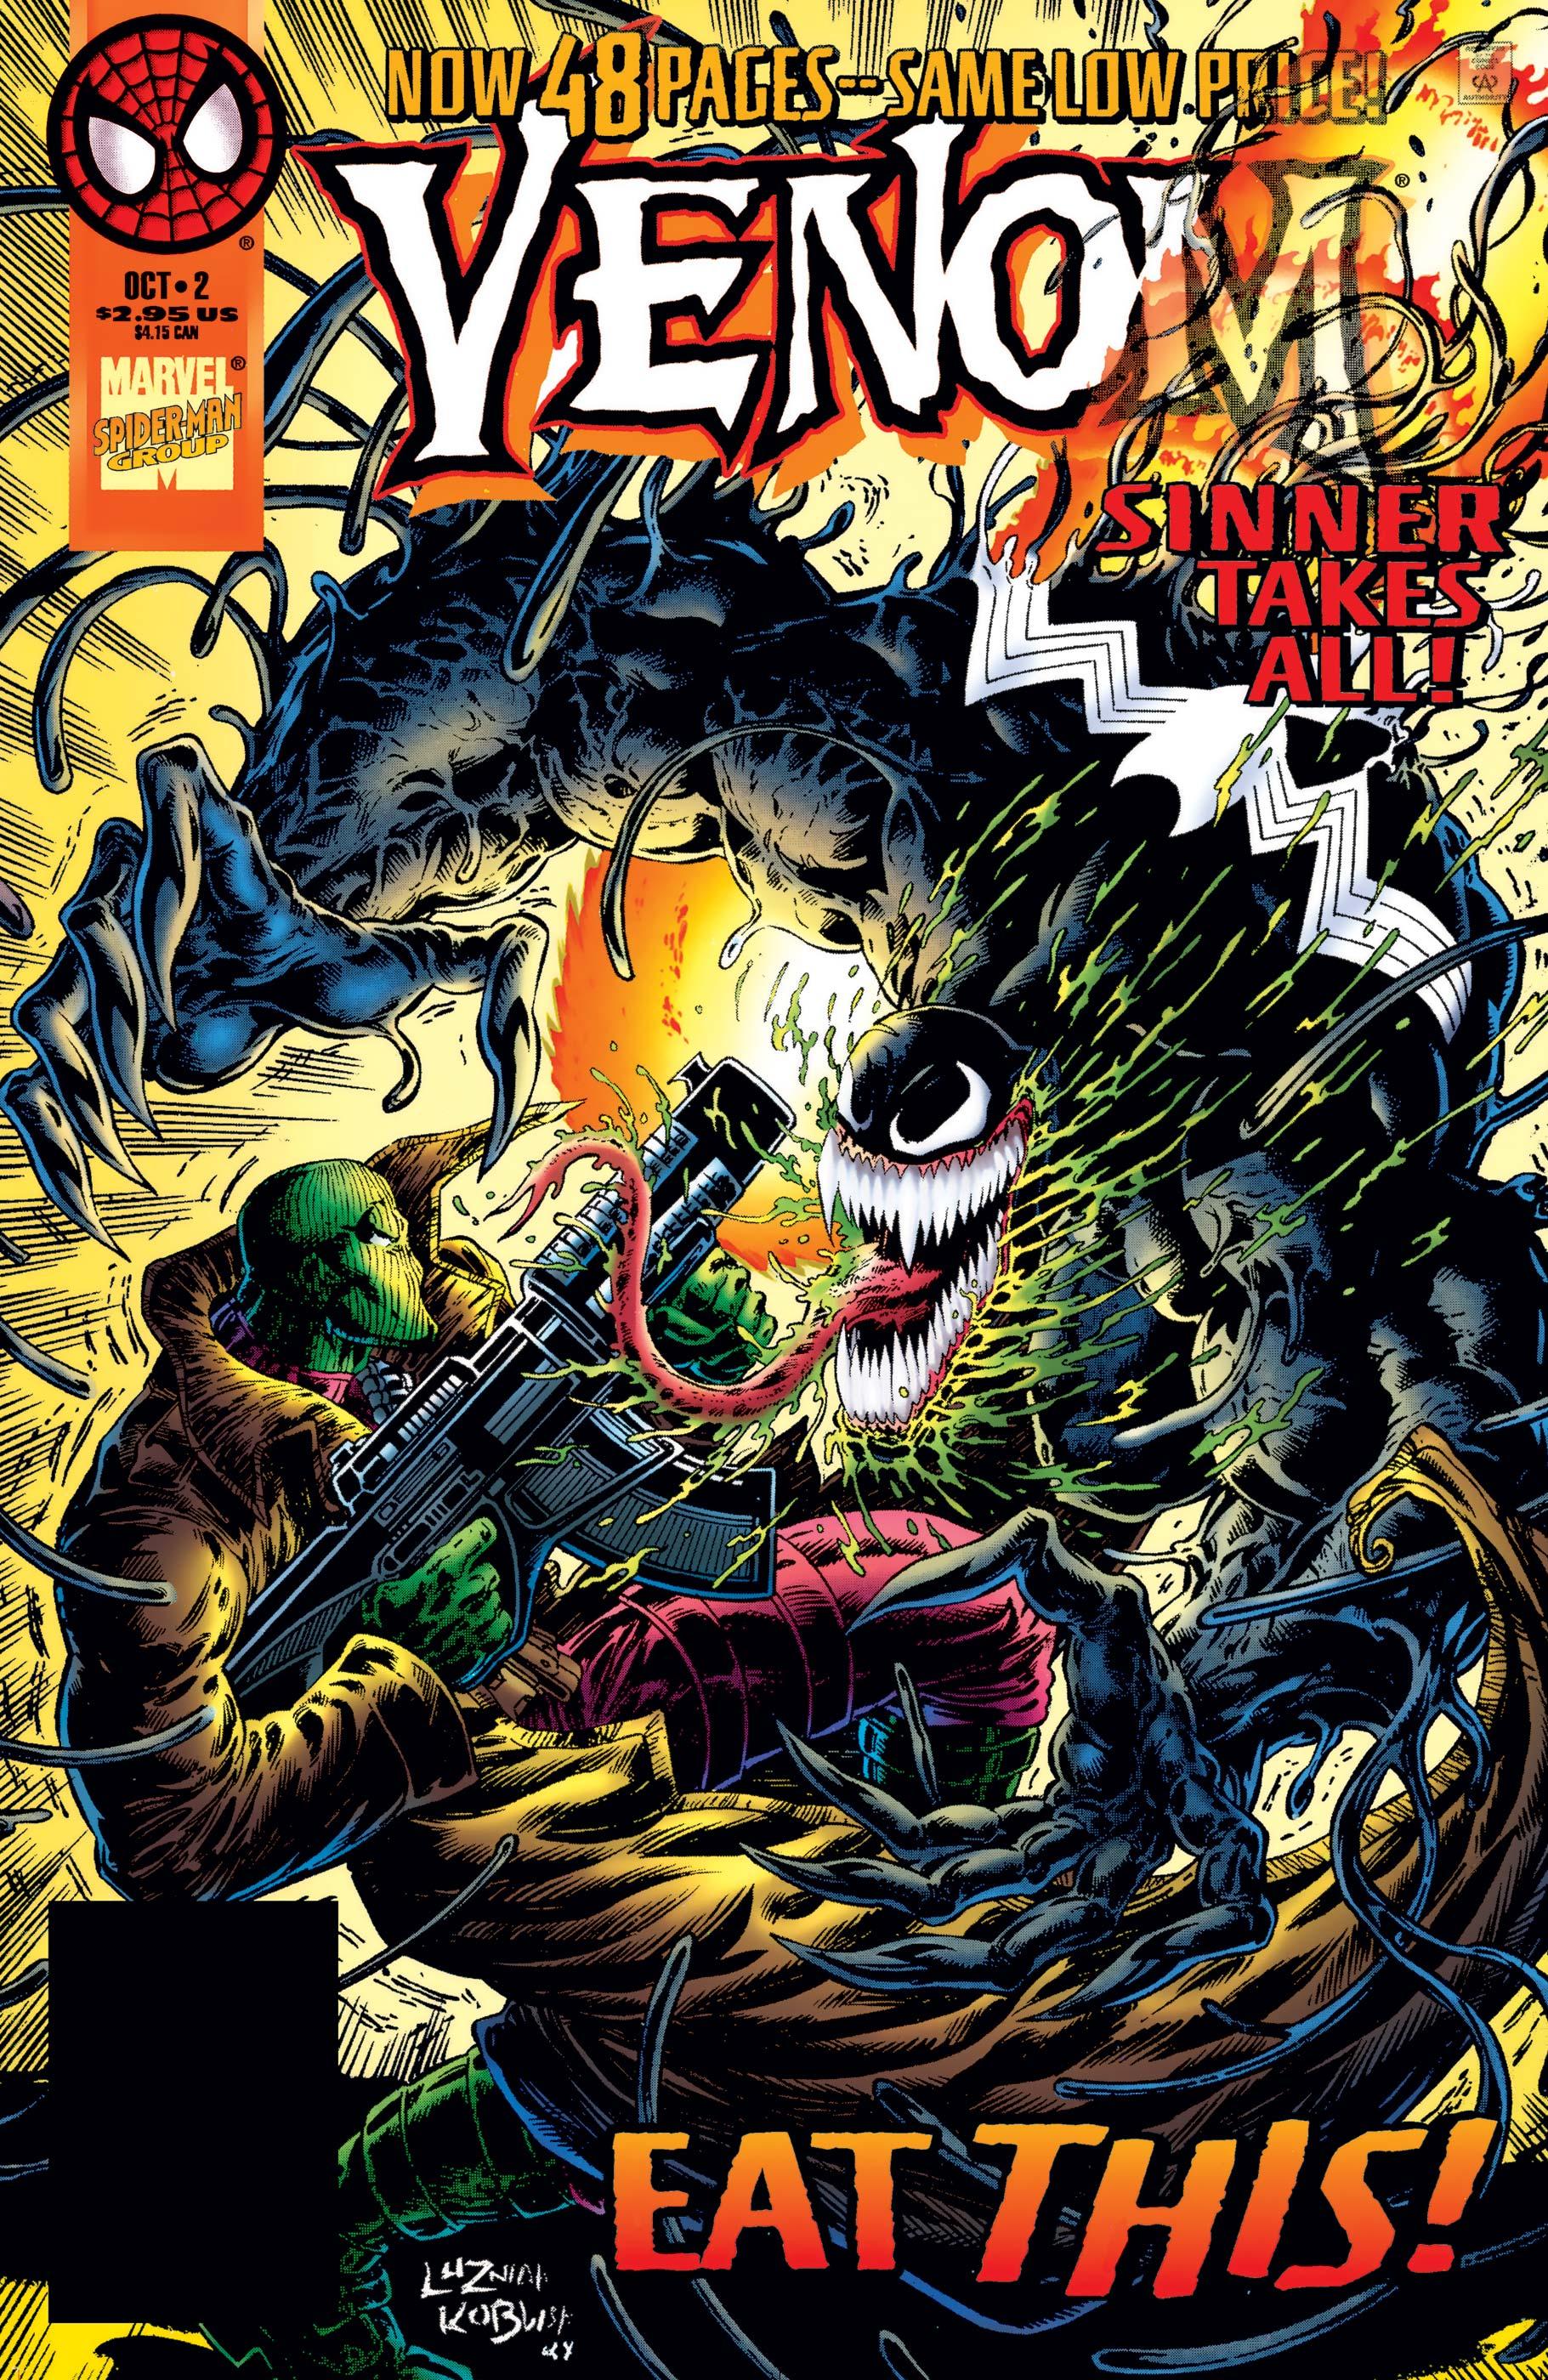 Venom: Sinner Takes All (1995) #2